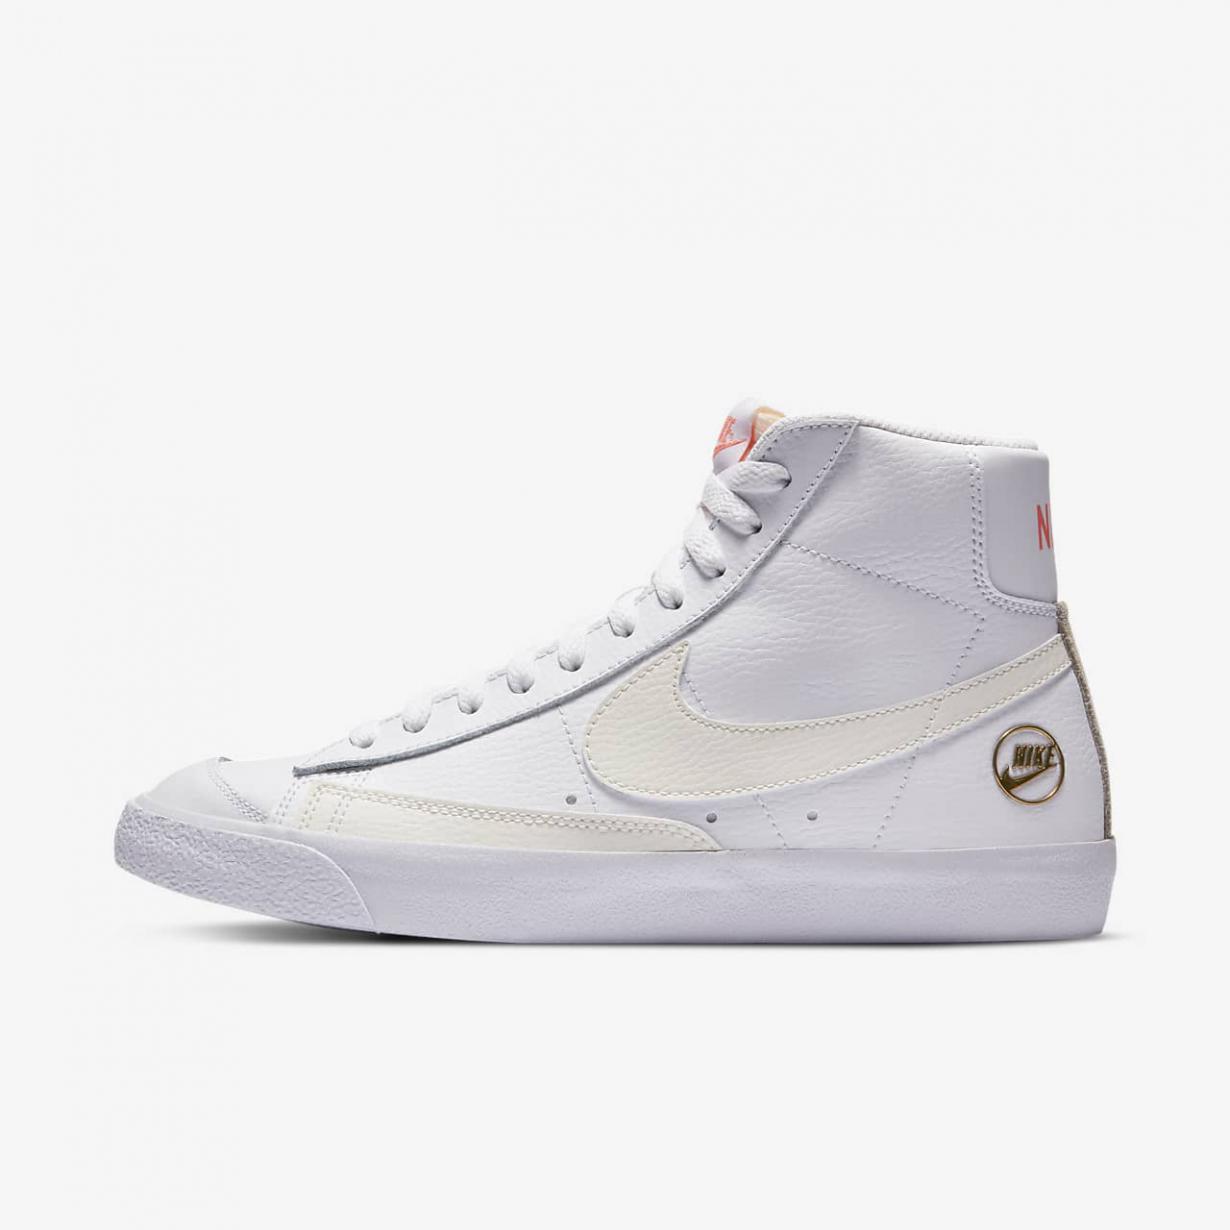 Nike Blazer < Nike En Ligne Pas Cher Vente - FR < Gooddaytricities